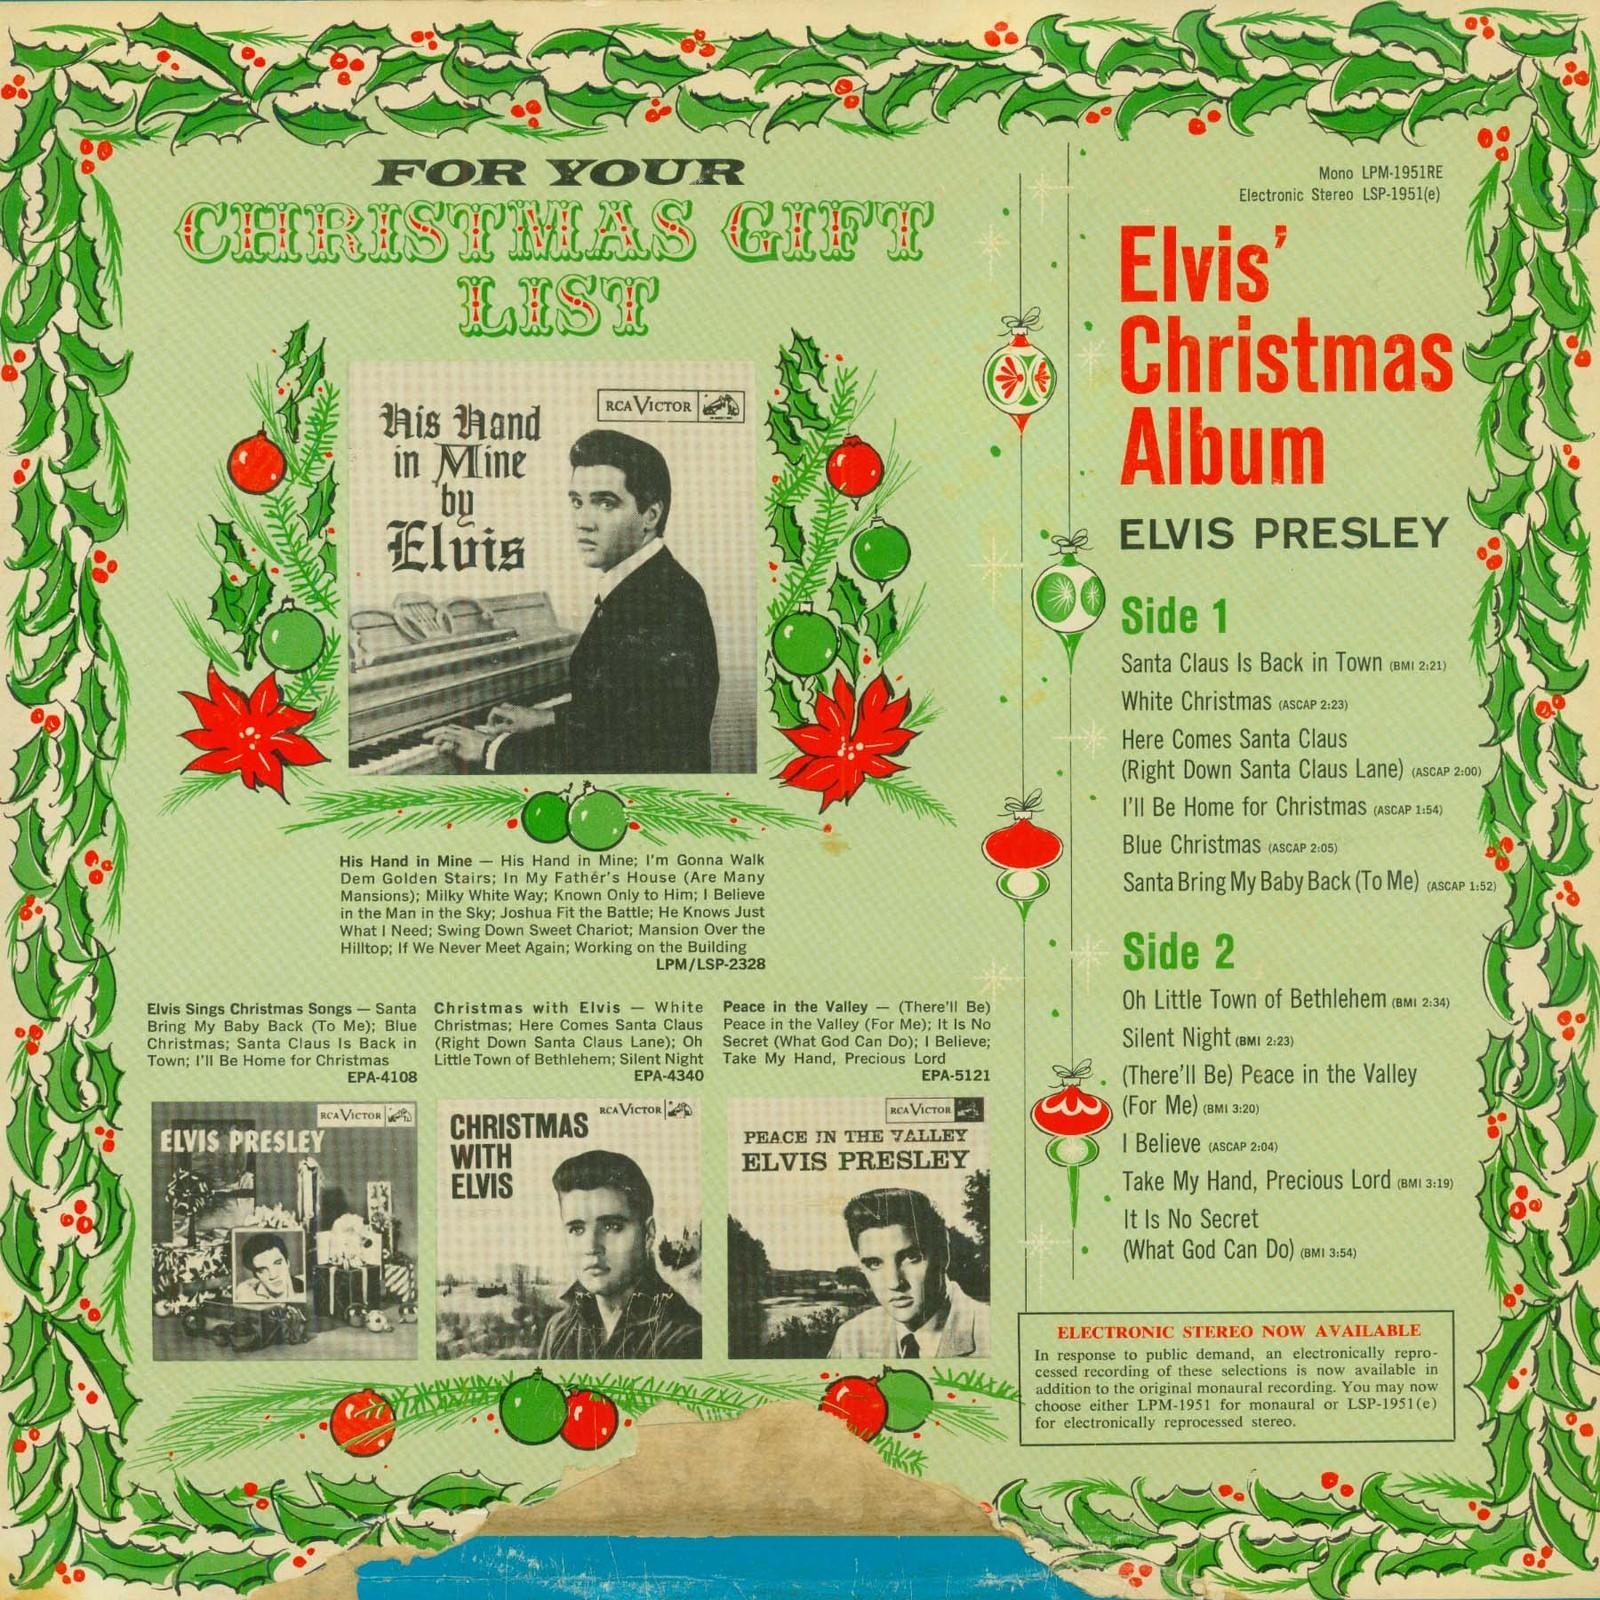 ELVIS' CHRISTMAS ALBUM 02ufypc